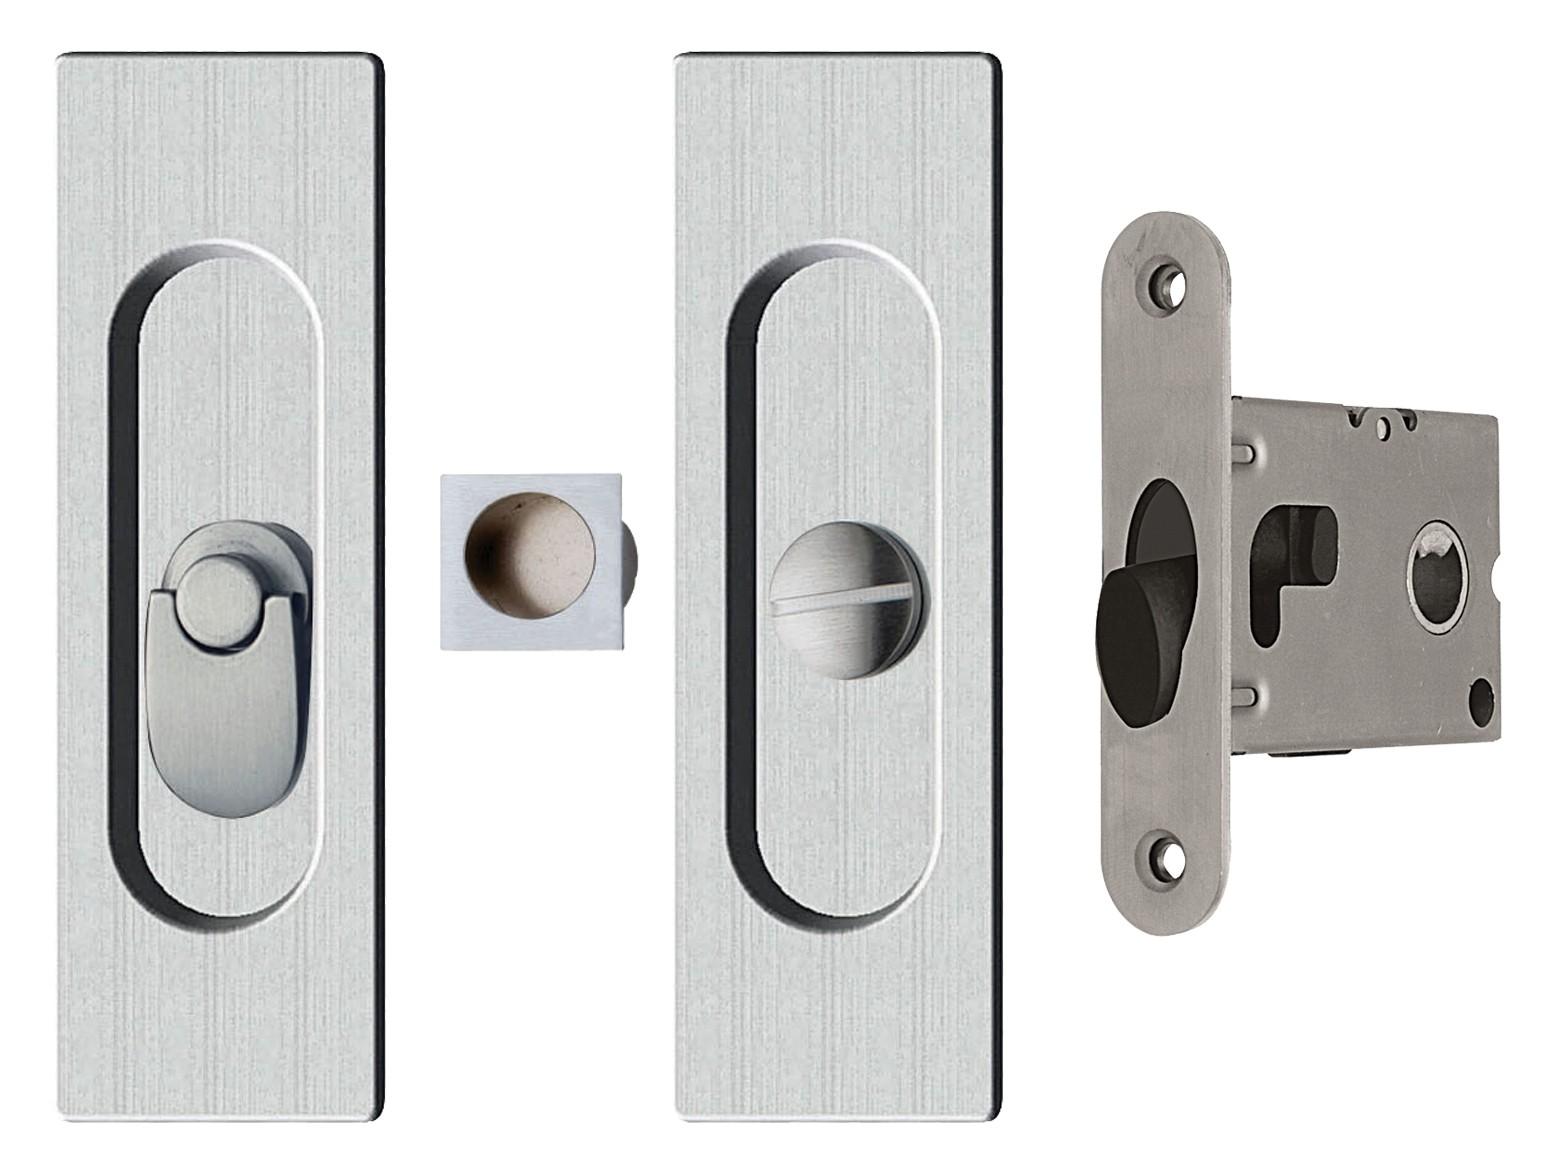 Ahi Sdk096pv 45 Privacy Pocket Door Kit Polished Chrome